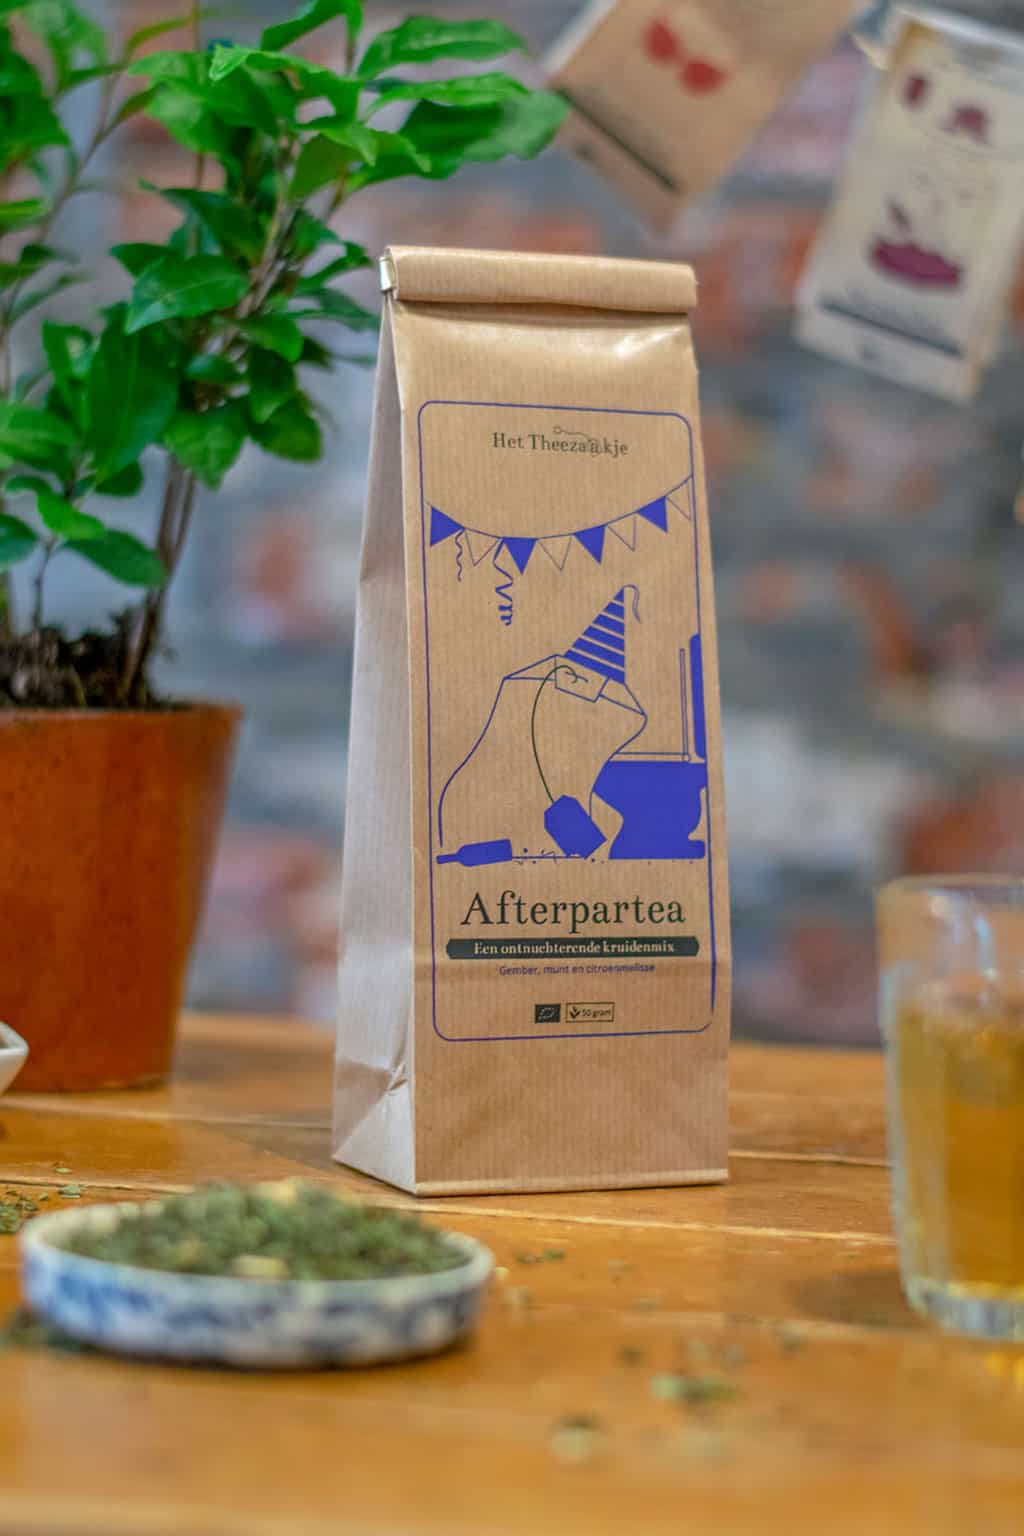 Afterpartea – Een ontnuchterende kruidenmix